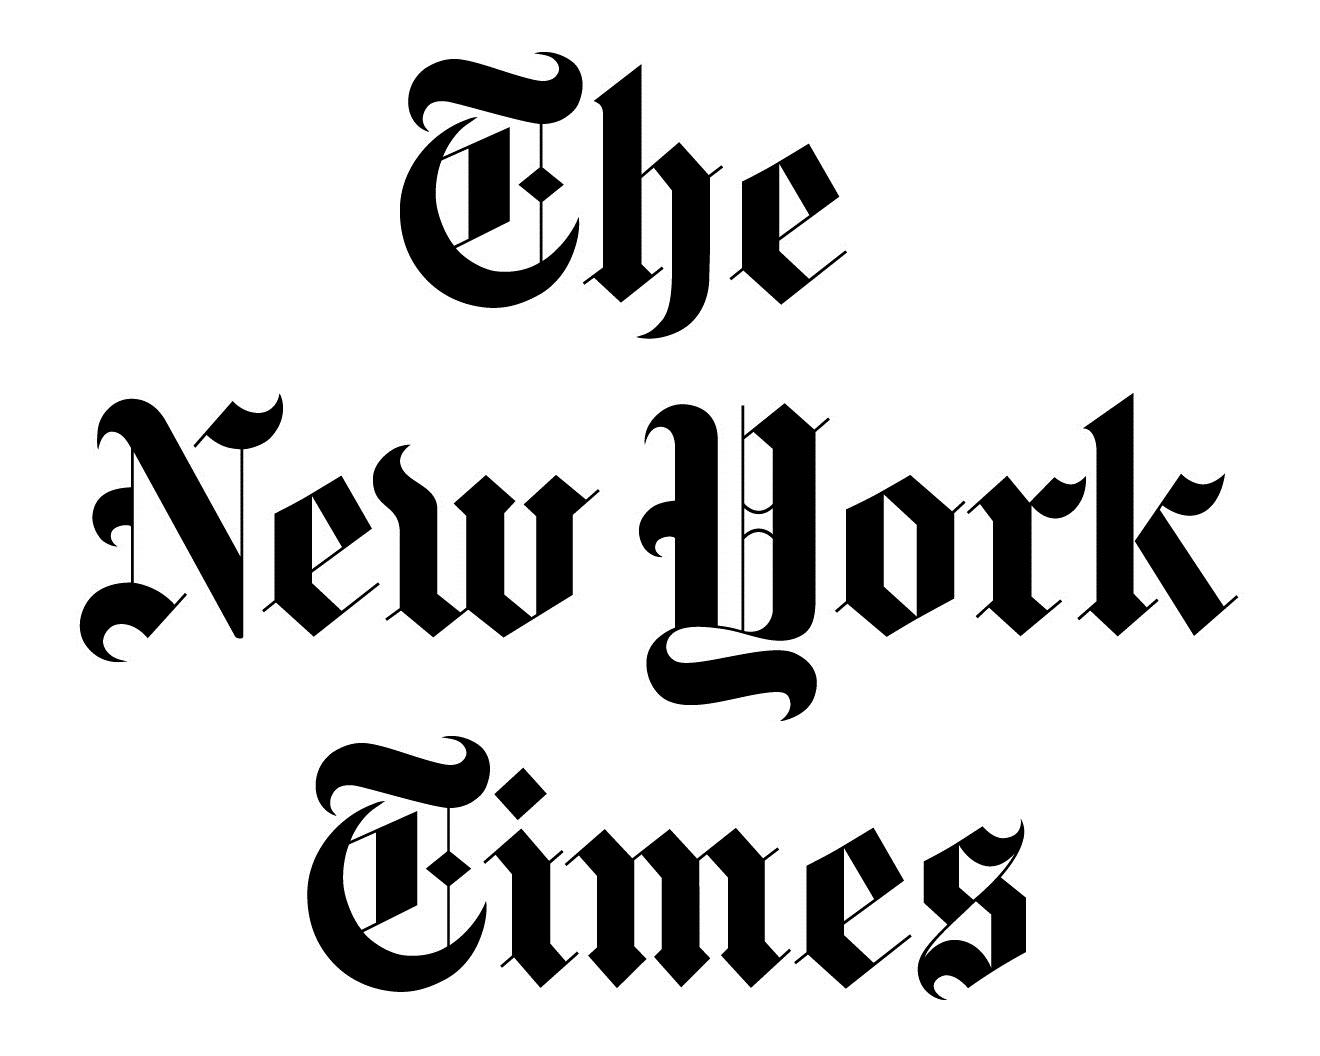 New_York_Times_logo_variation-8